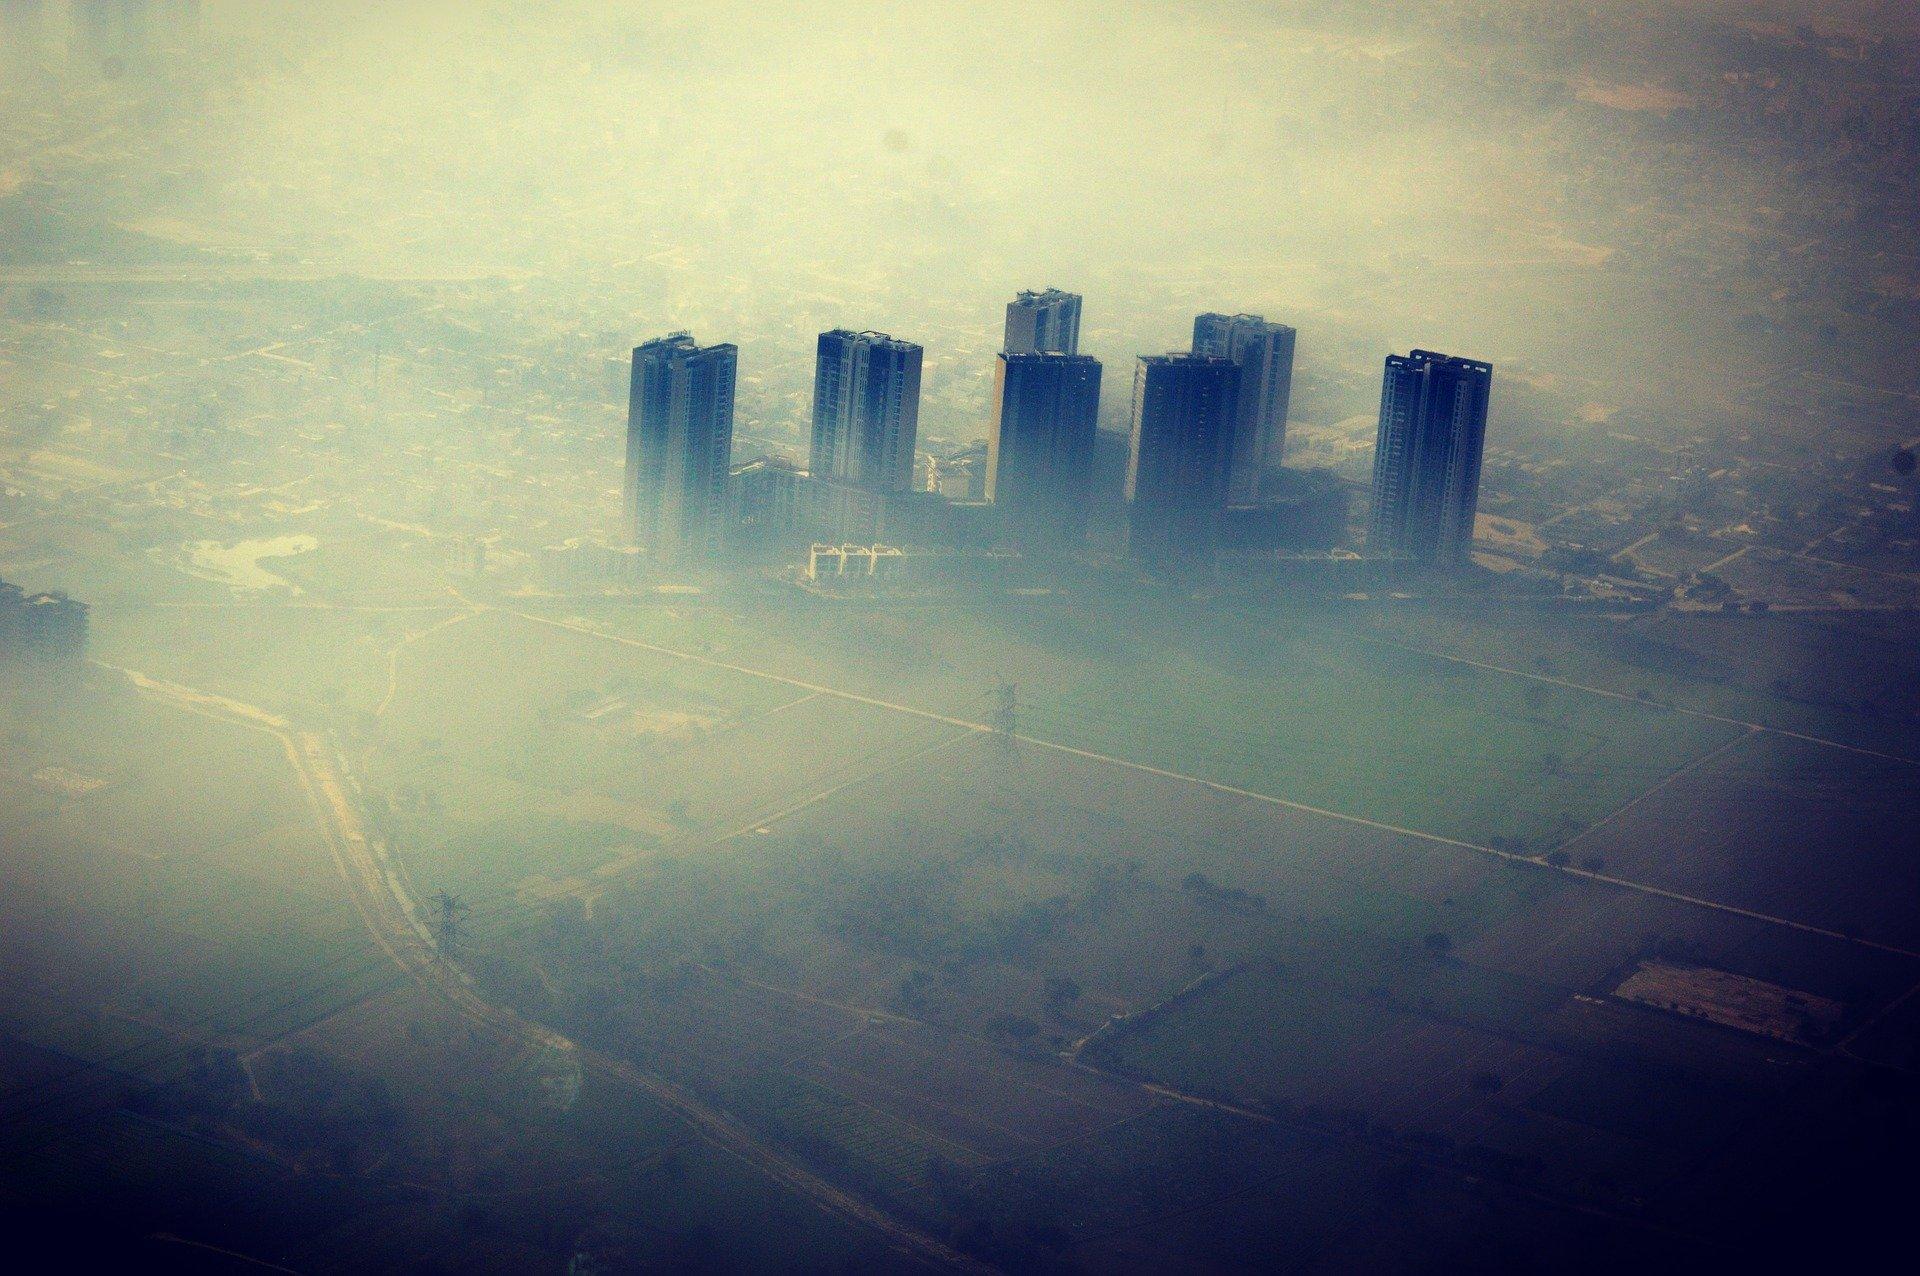 Air pollution above a city